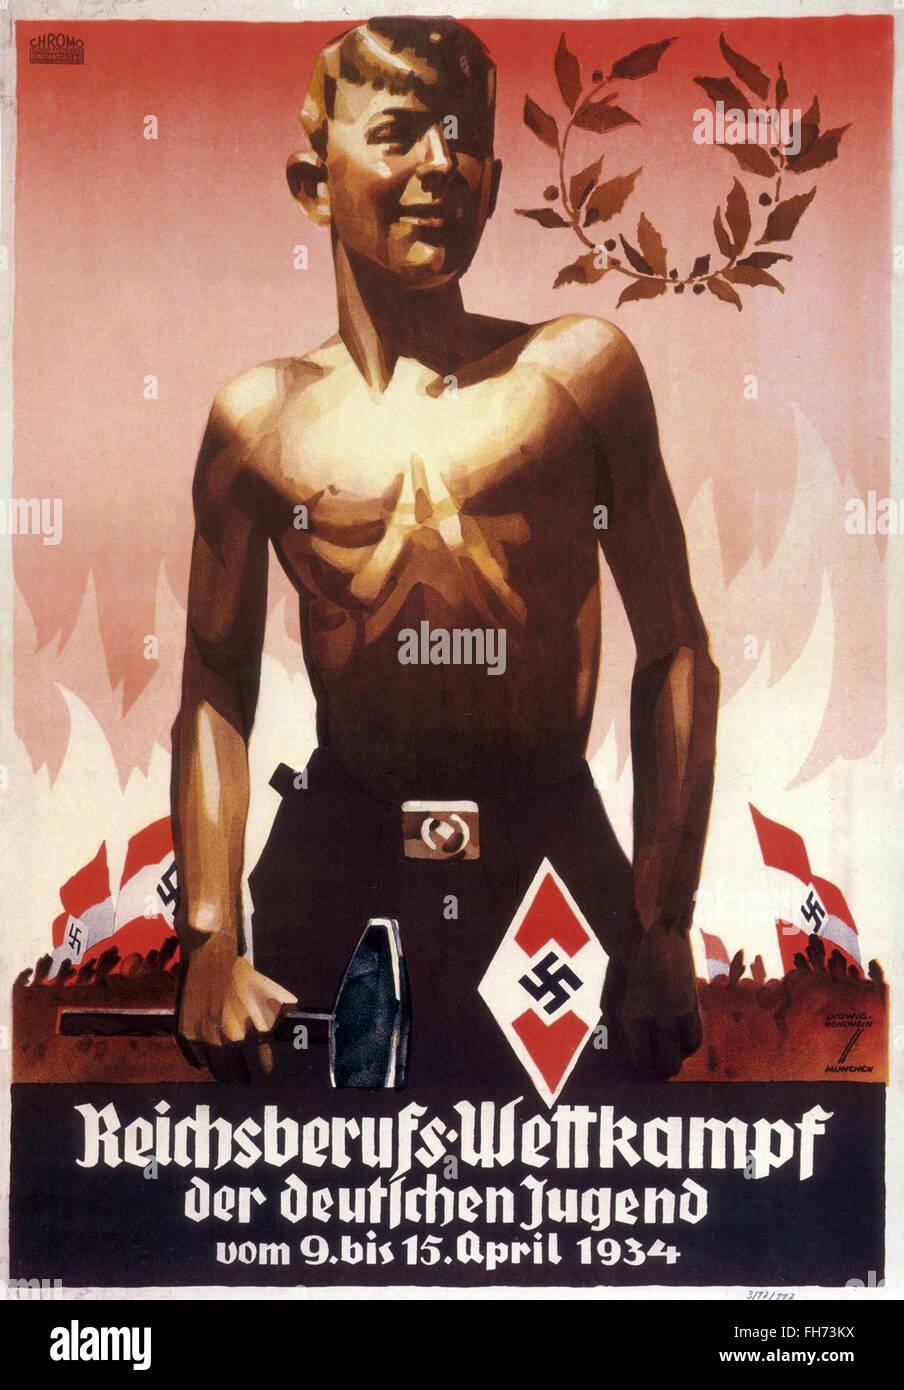 - German Nazi Propaganda Poster - 1934 - Stock Image